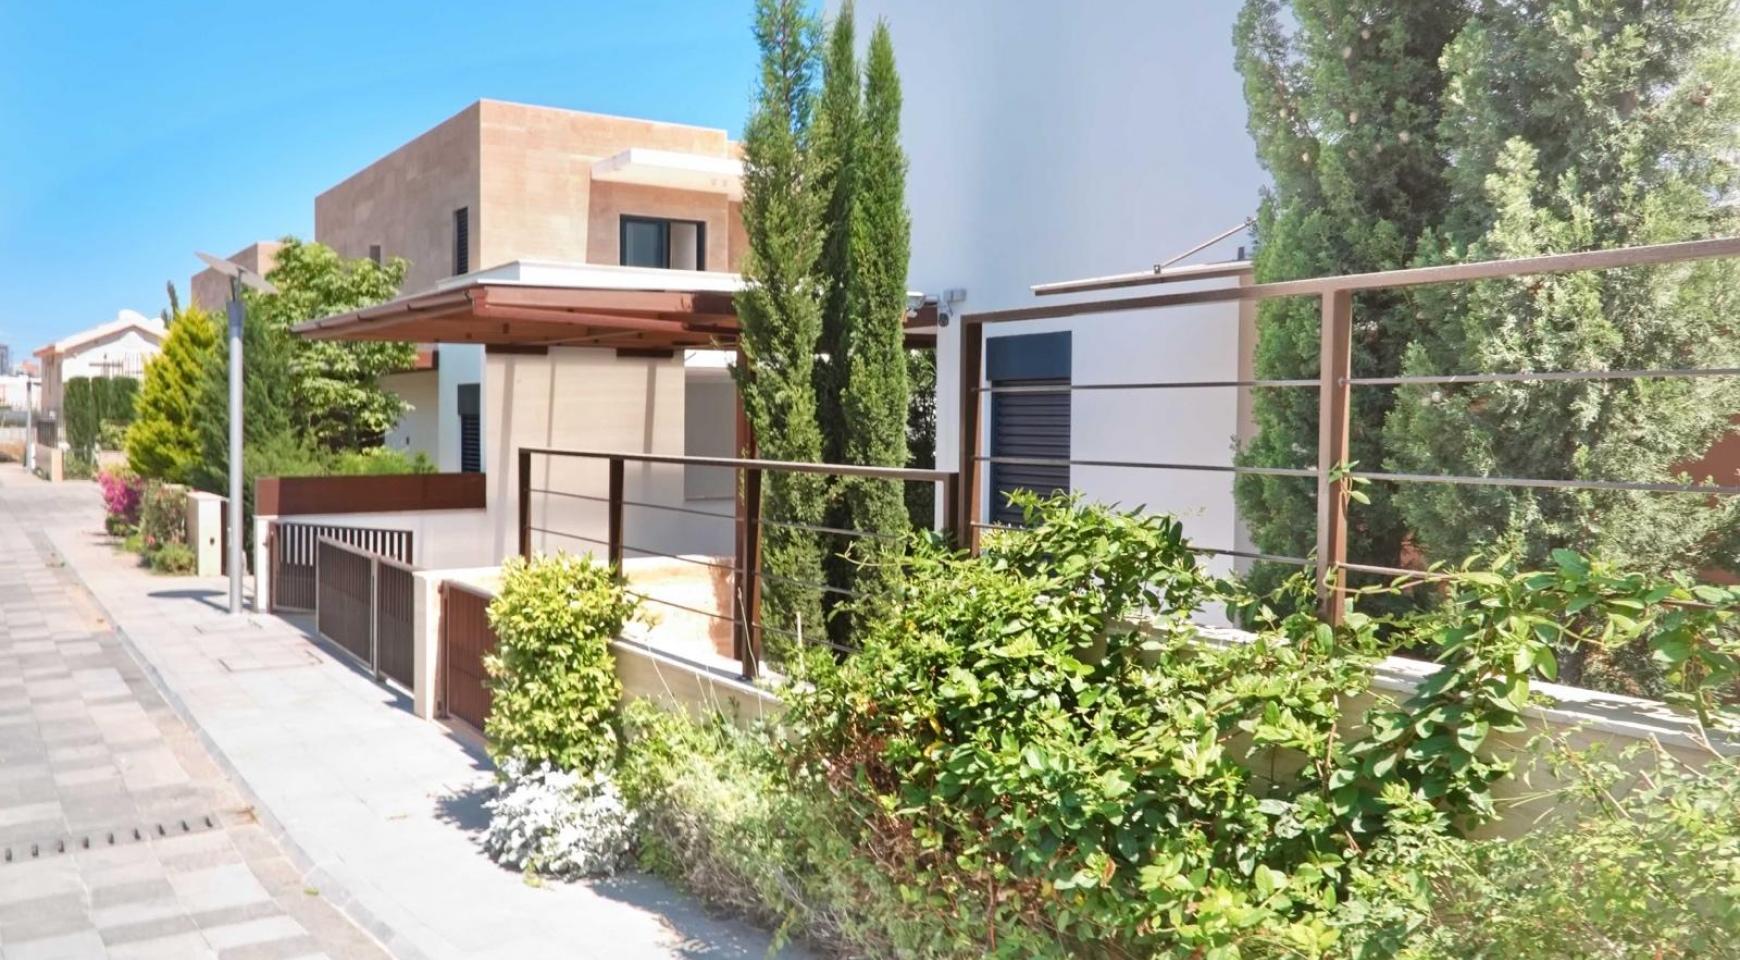 New Luxurious 4 Bedroom Villa in the Tourist Area - 12